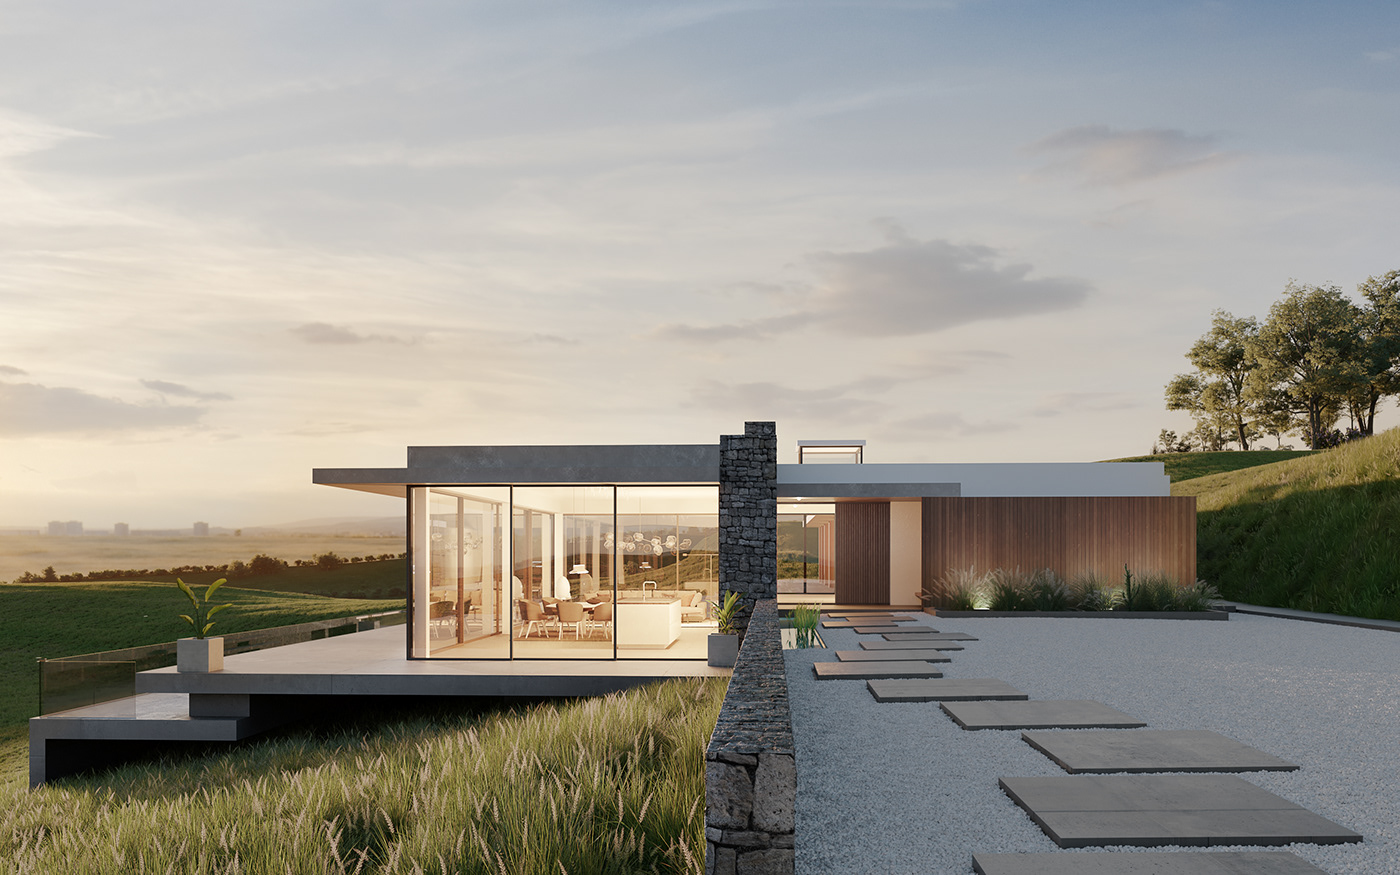 3dsmax corona render  field home house luxury Villa visualization